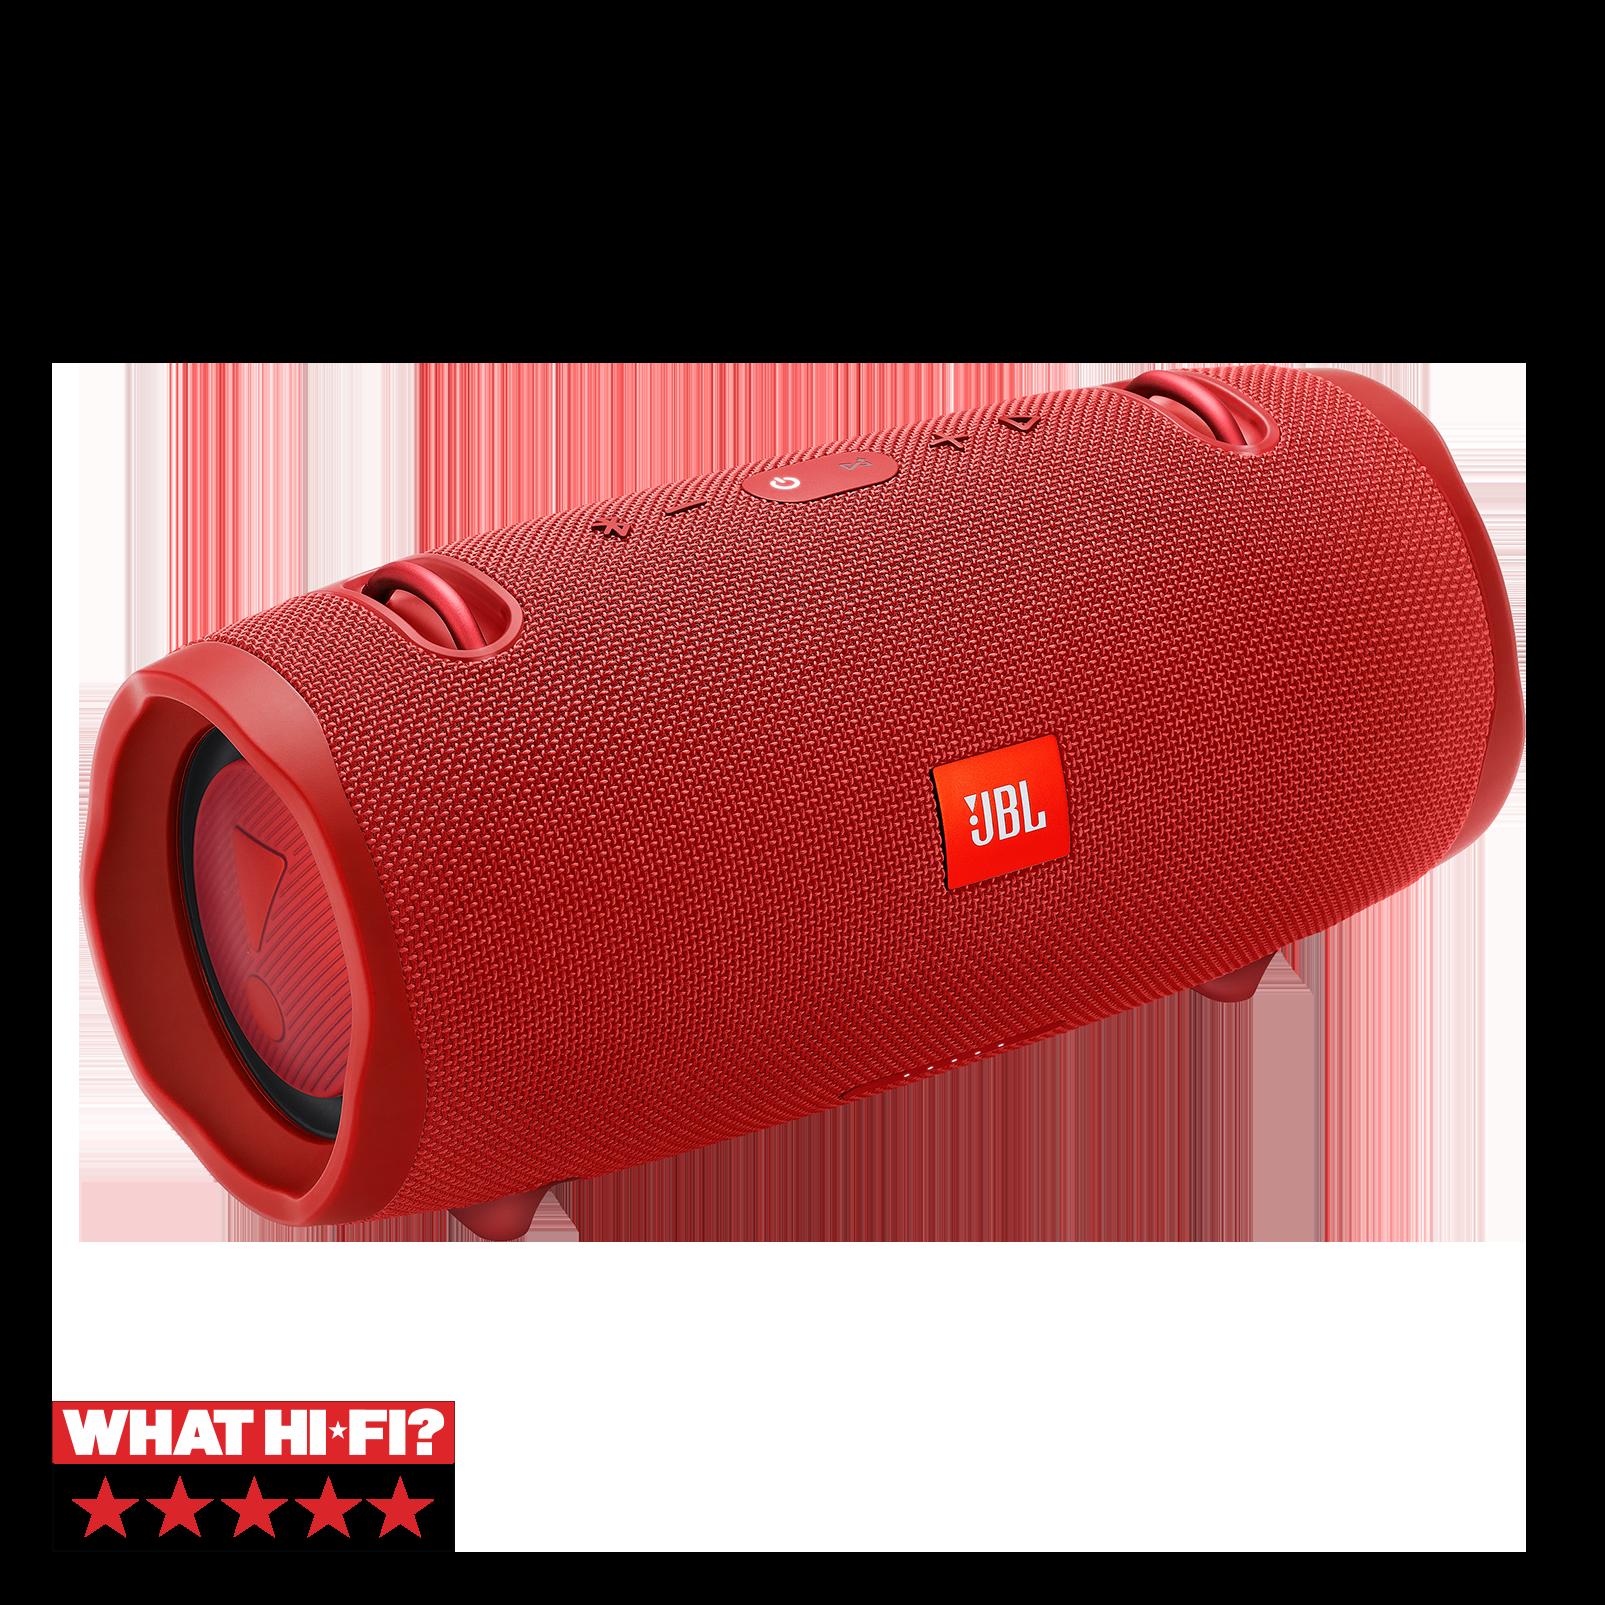 JBL Xtreme 2 - Red - Portable Bluetooth Speaker - Hero